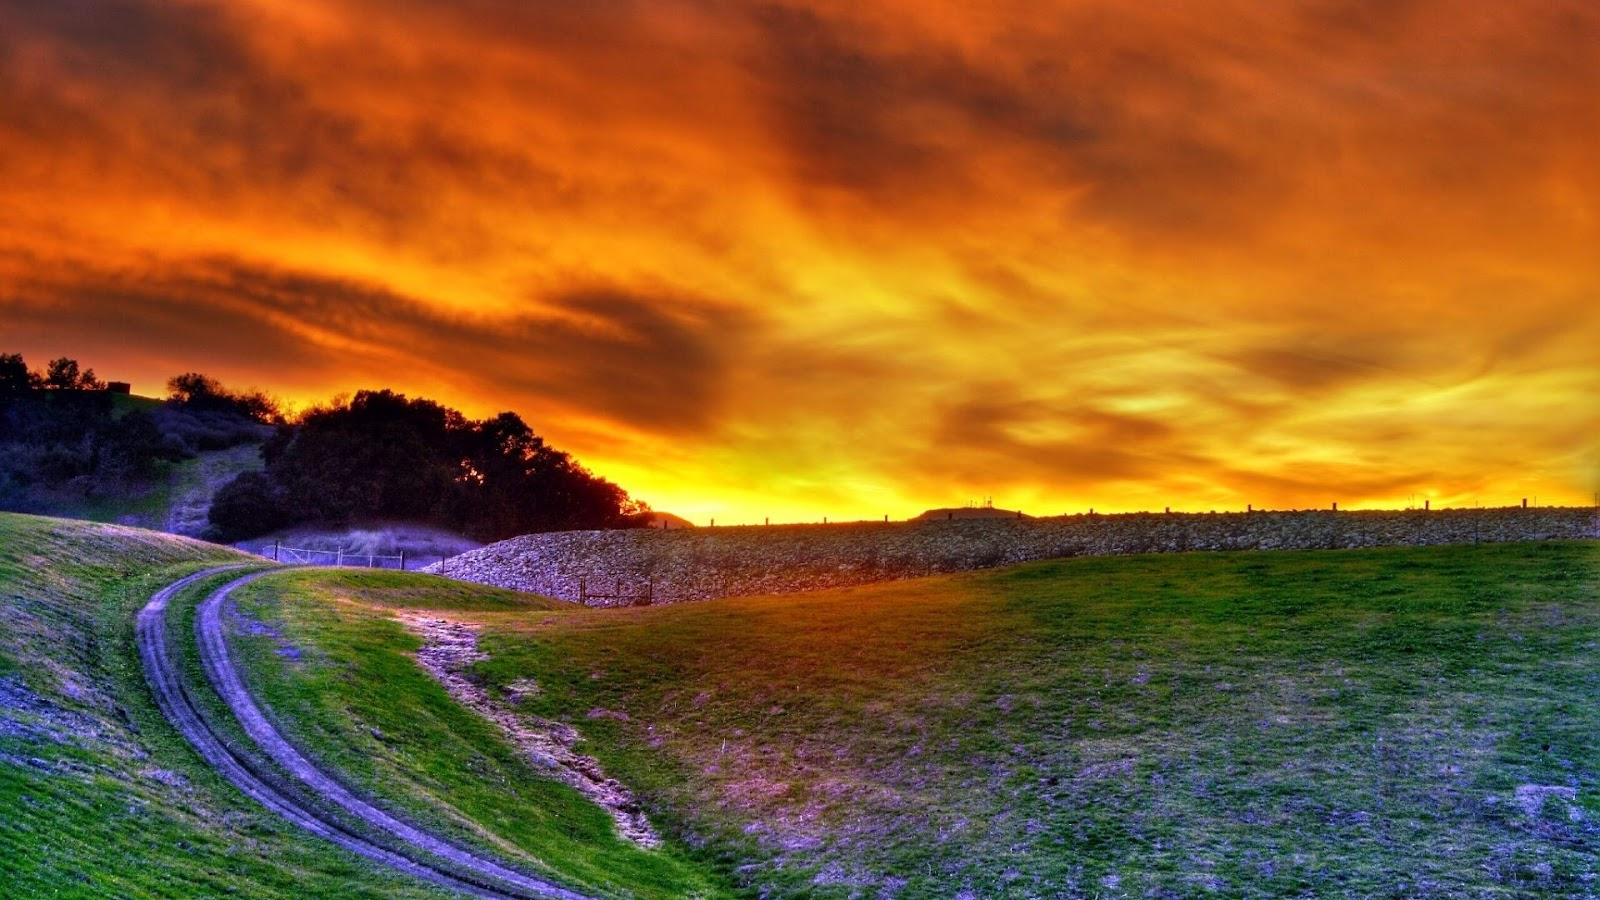 Sun Set HD Wallpapers | Hd Wallpaper